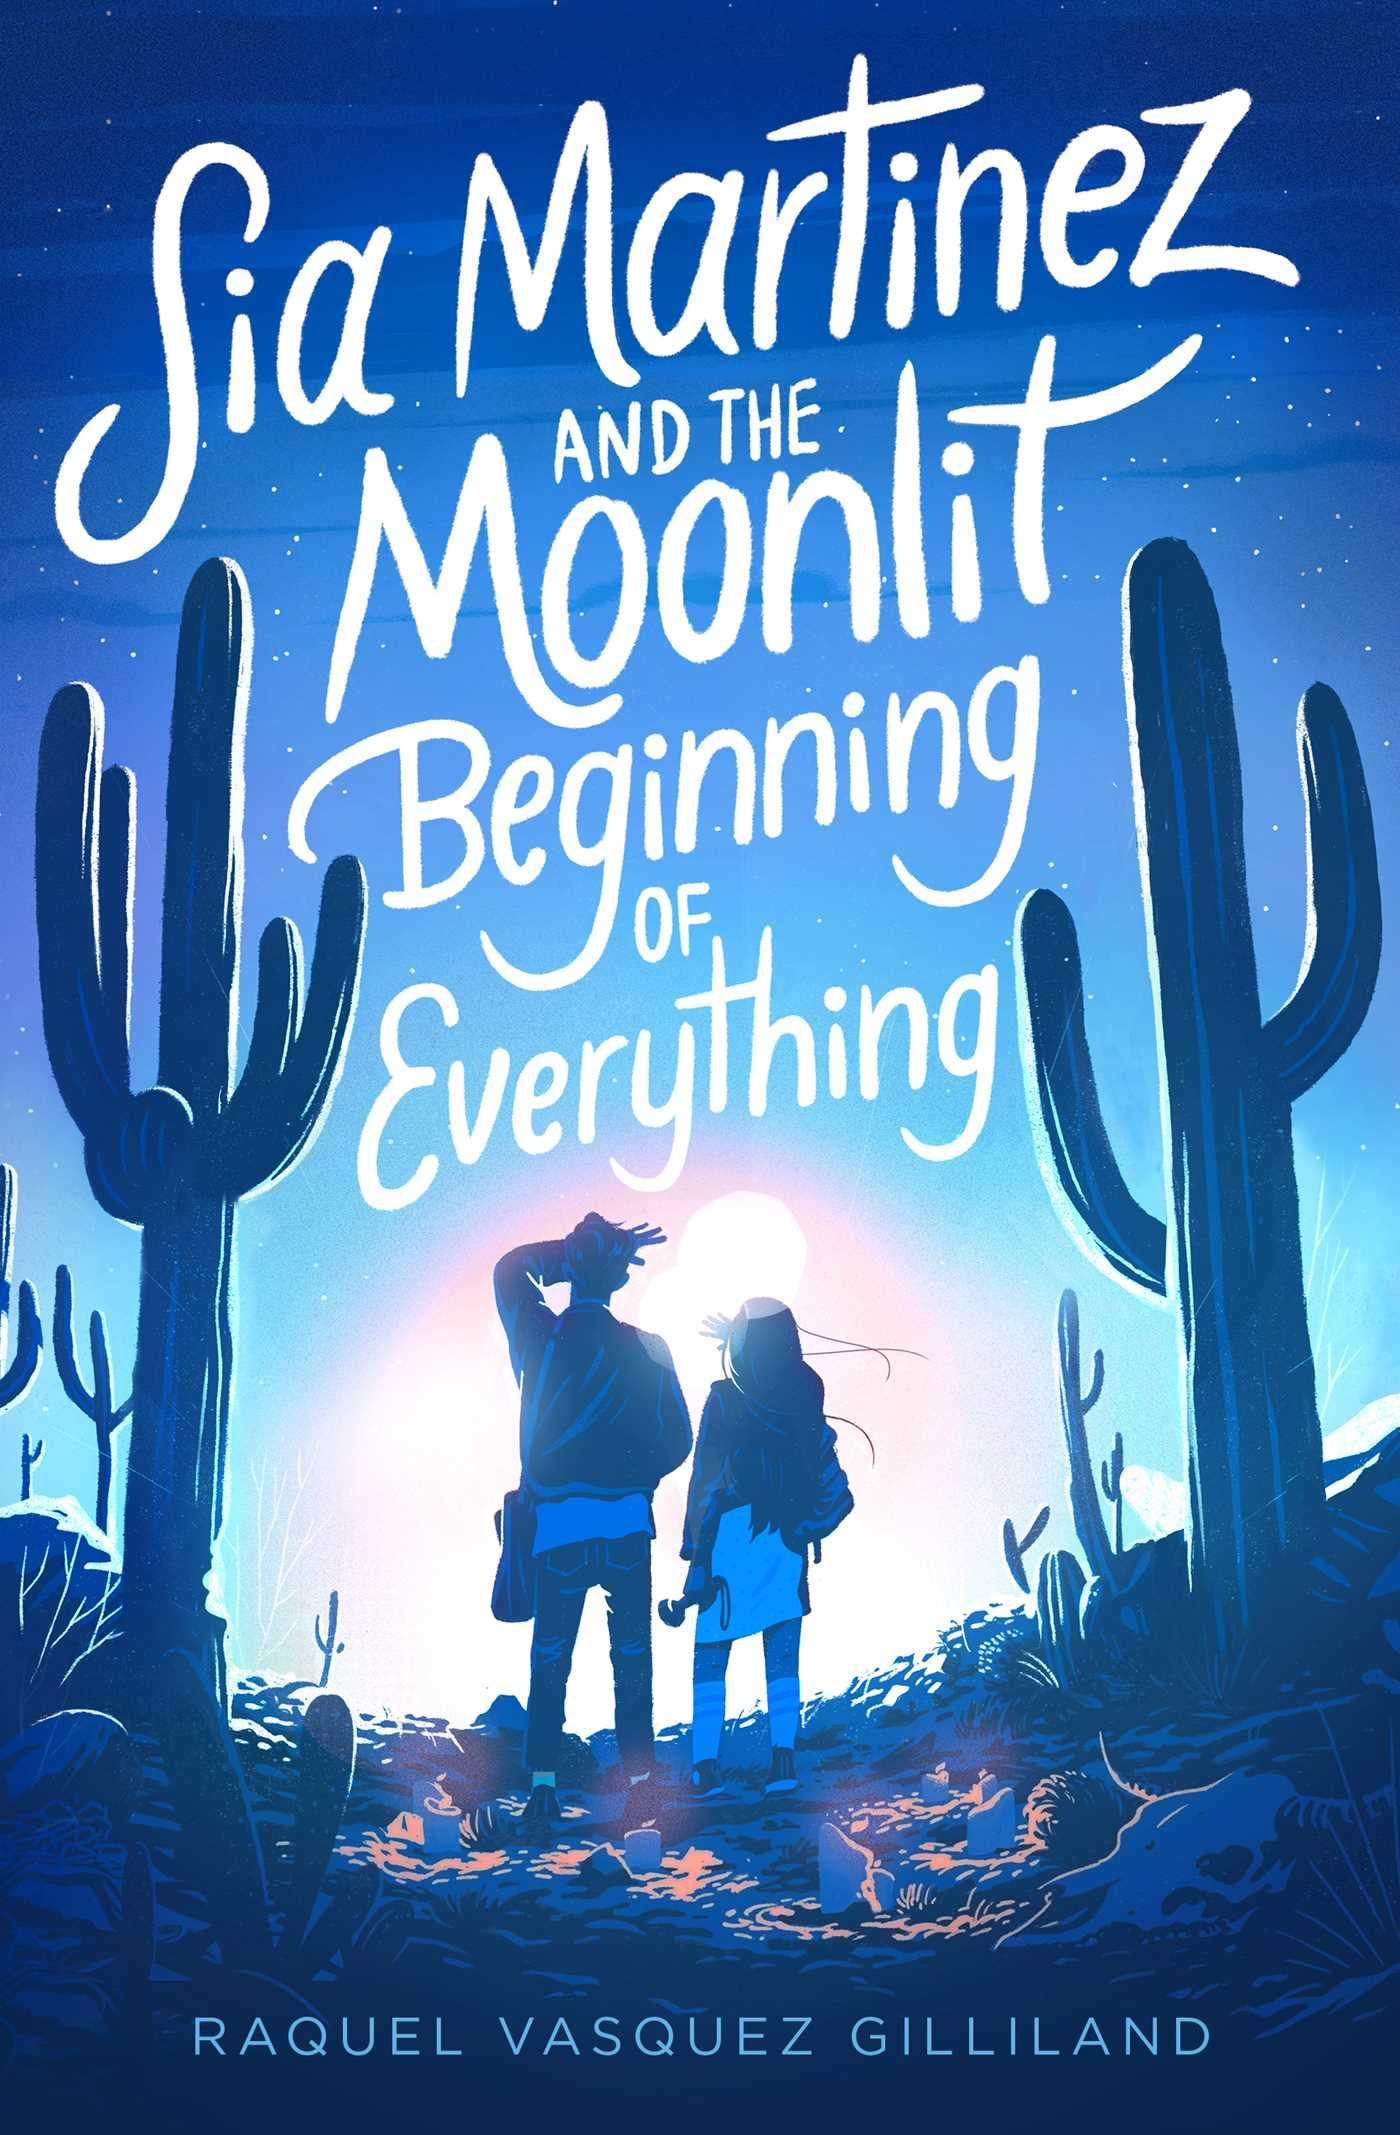 Amazon.com: Sia Martinez and the Moonlit Beginning of Everything  (9781534448636): Gilliland, Raquel Vasquez: Books